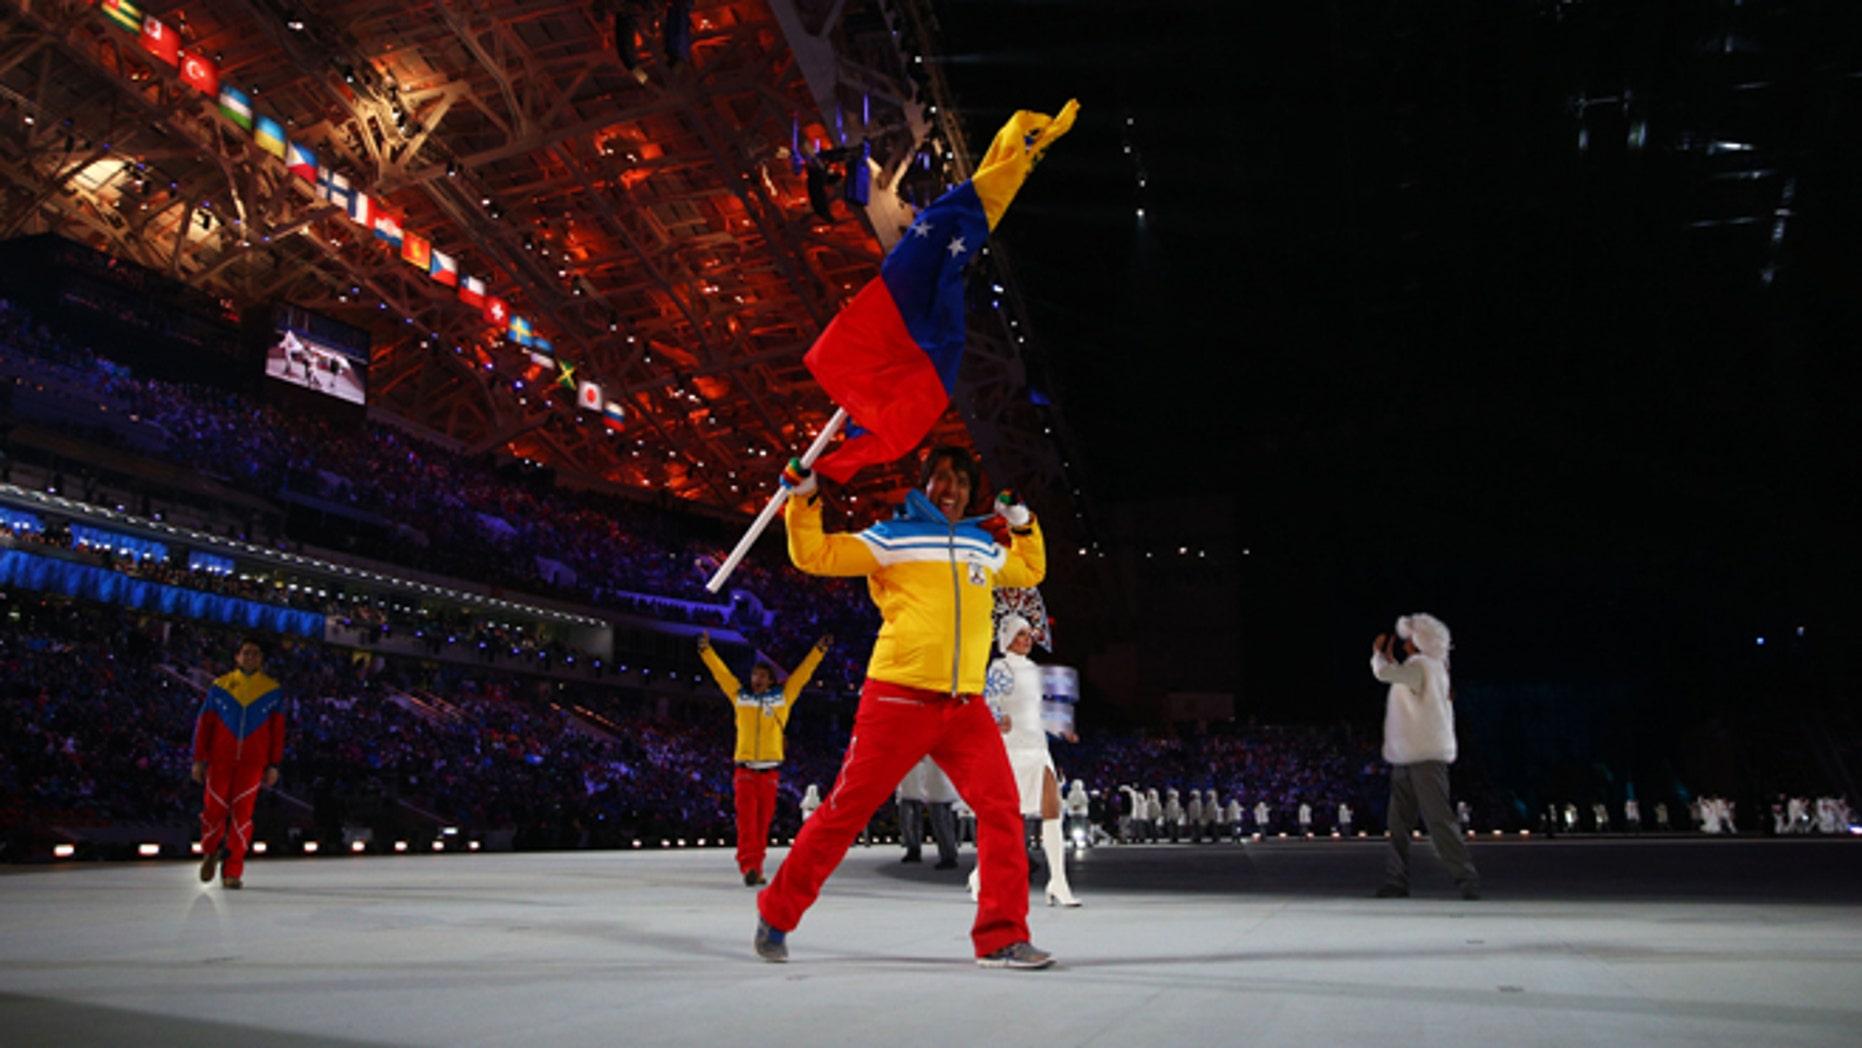 Venezuelan skier Antonio Pardo during the Opening Ceremony of the Sochi 2014 Winter Olympics.